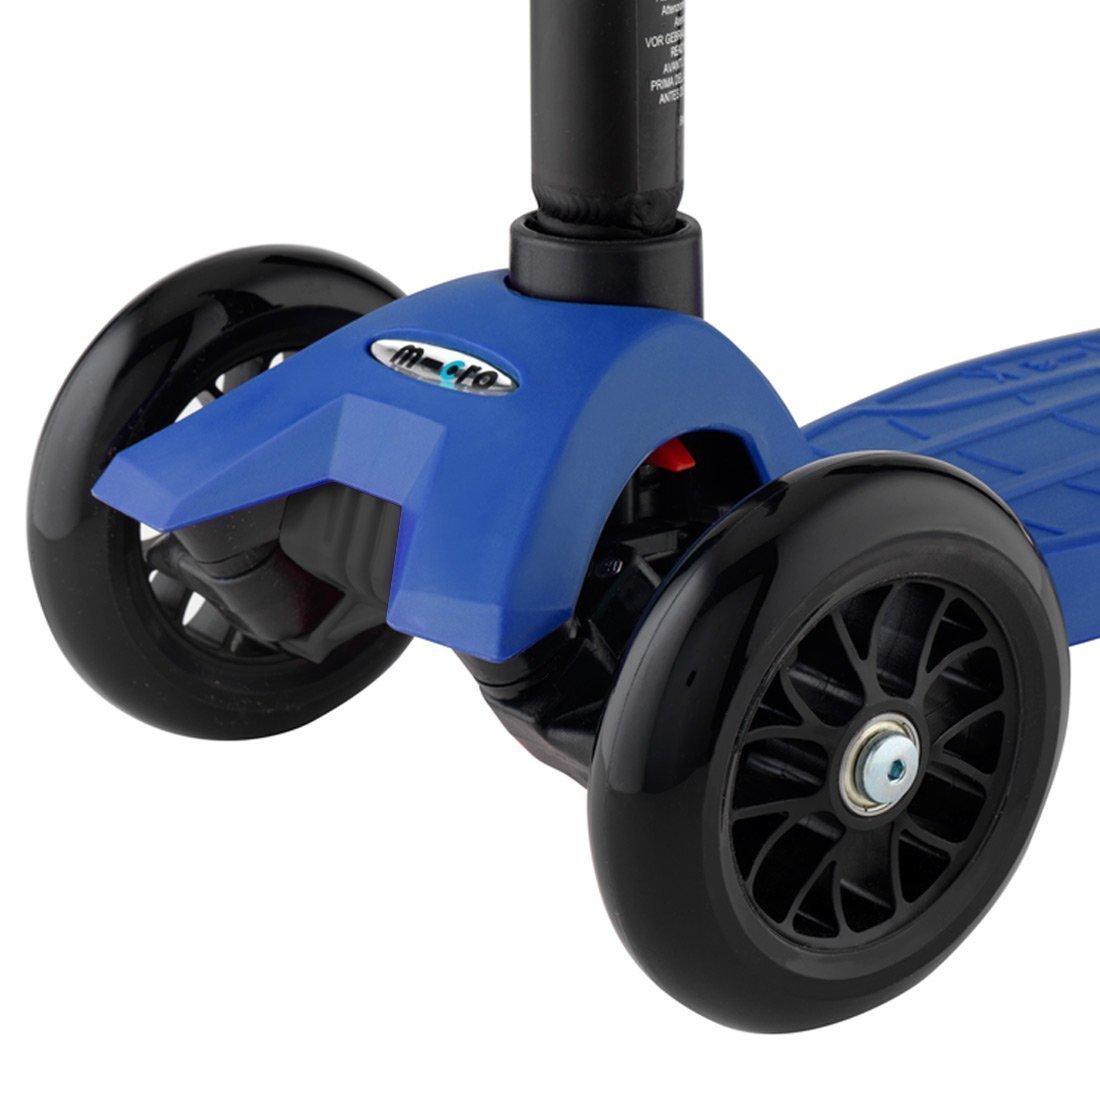 Micro Mini Original Kick Scooter reviews